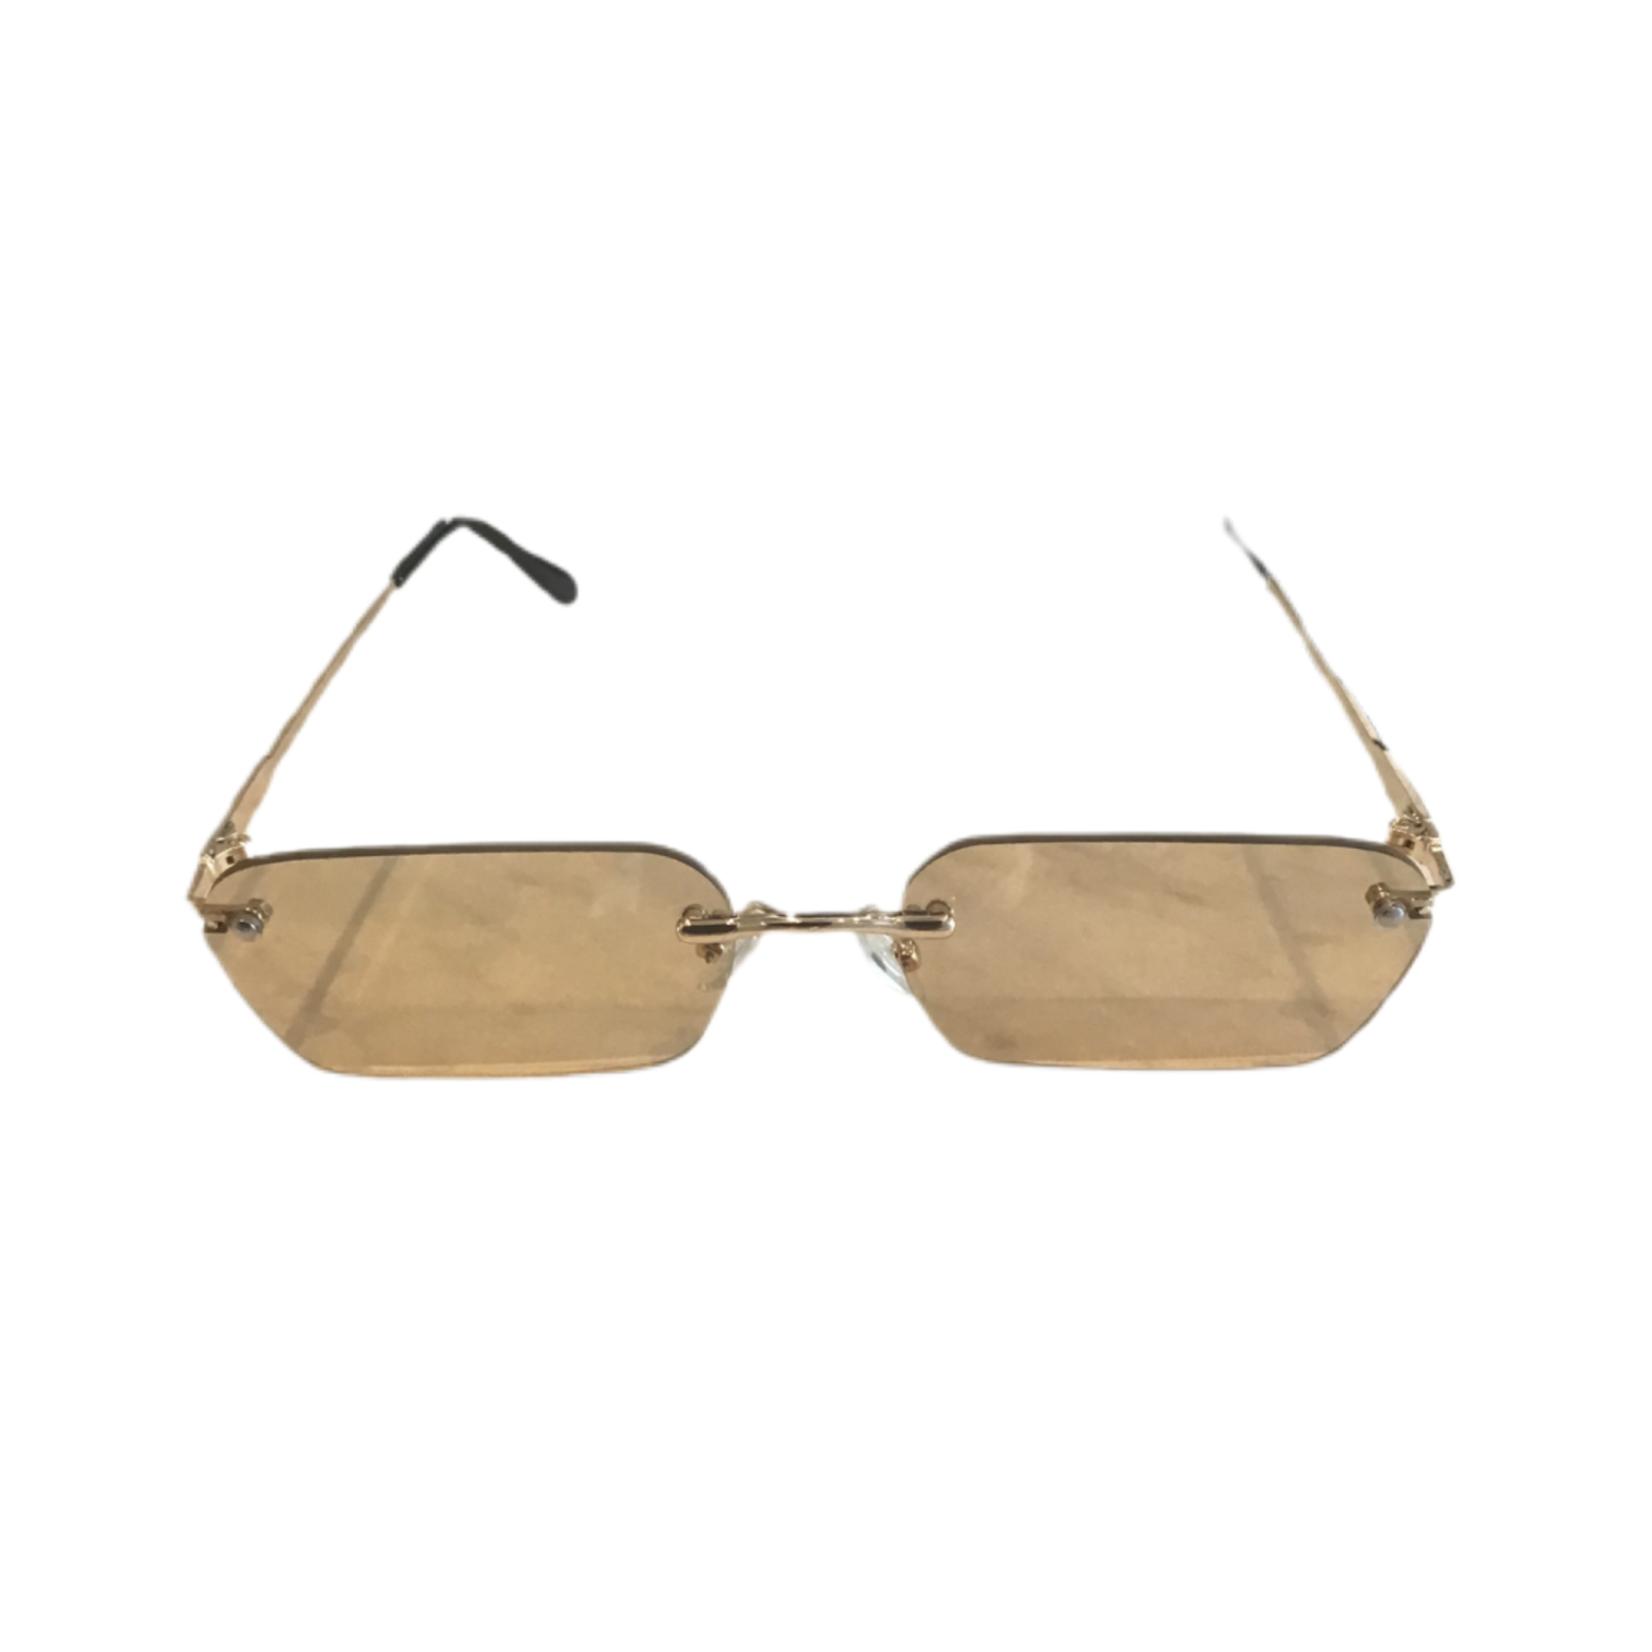 Wyld Blue Tan rectangle sunglasses